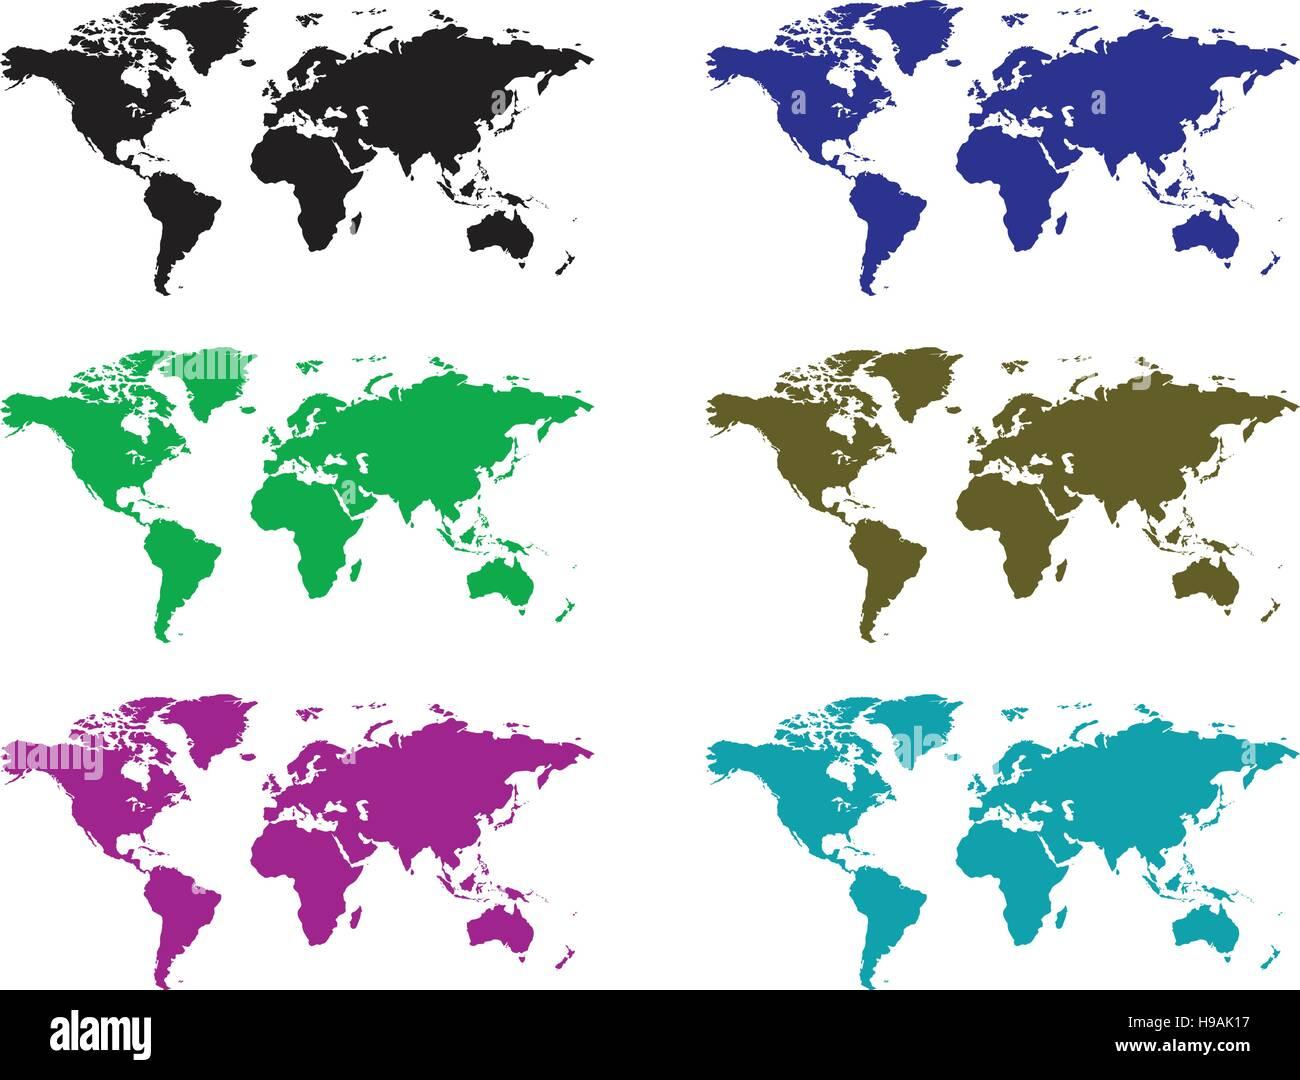 earth map icon colour set - Stock Image